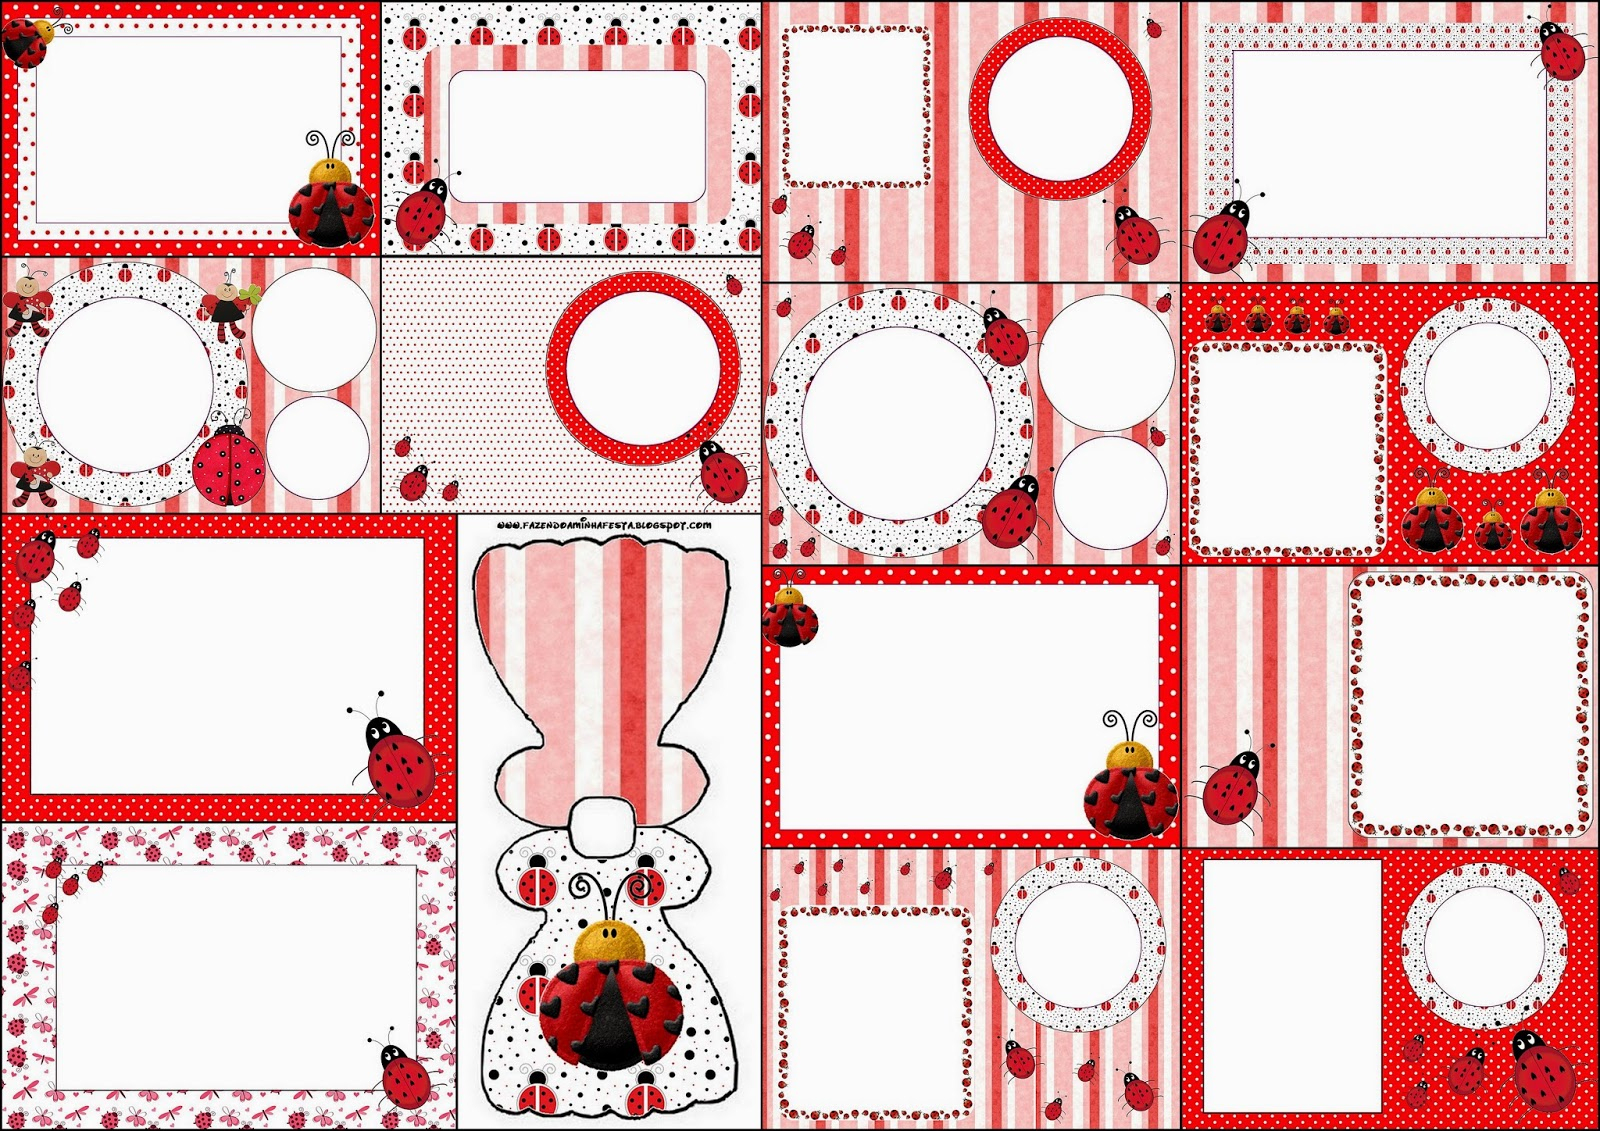 Ladybugs: Free Printable Invitations. | Oh My Fiesta! In English - Free Printable Ladybug Invitations